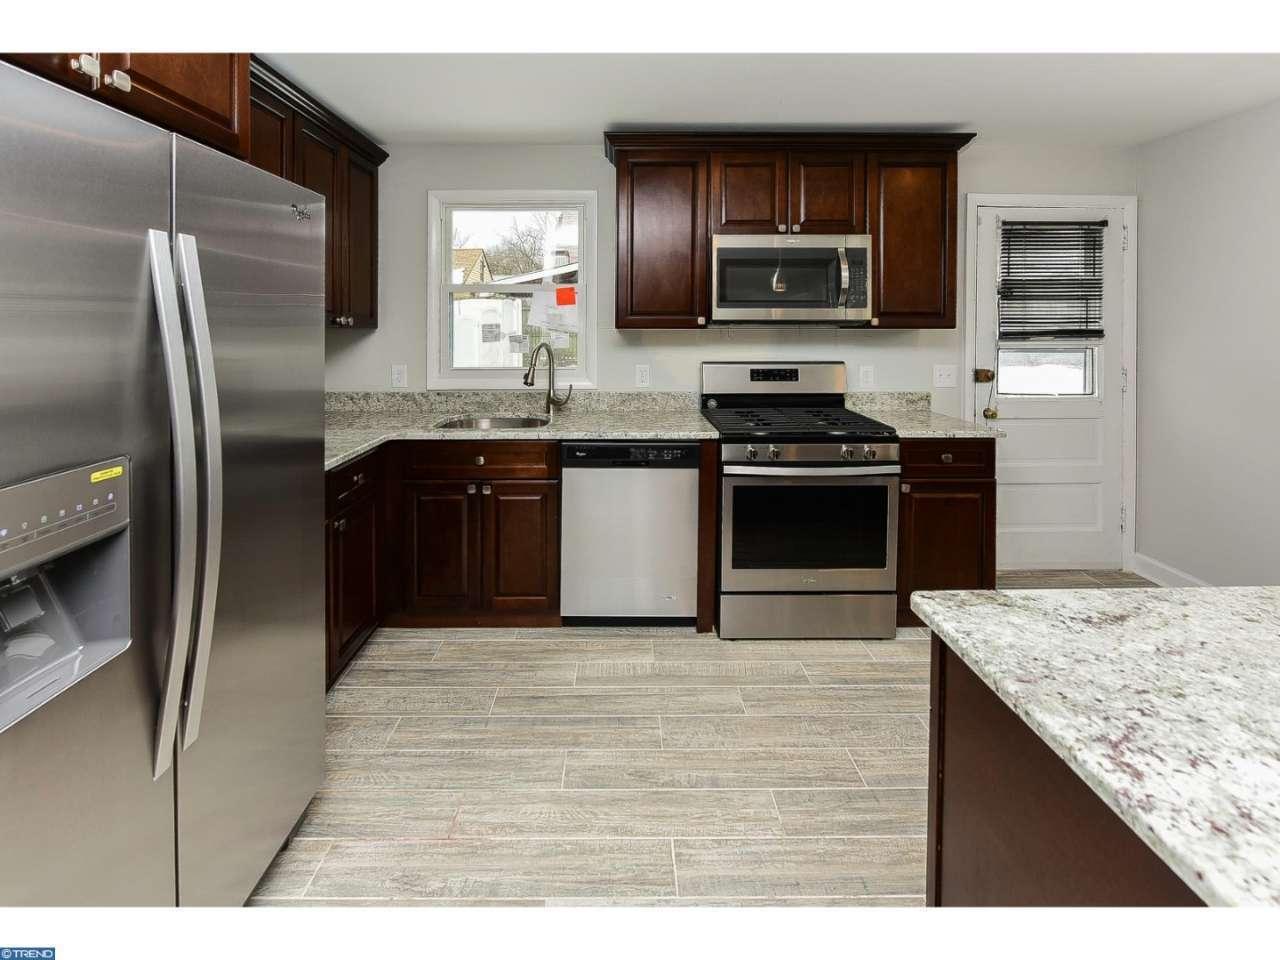 7113 LEE Ave  PENNSAUKEN  NJ 08110   MLS  6910545   Redfin. Discount Kitchen Cabinets Pennsauken Nj. Home Design Ideas